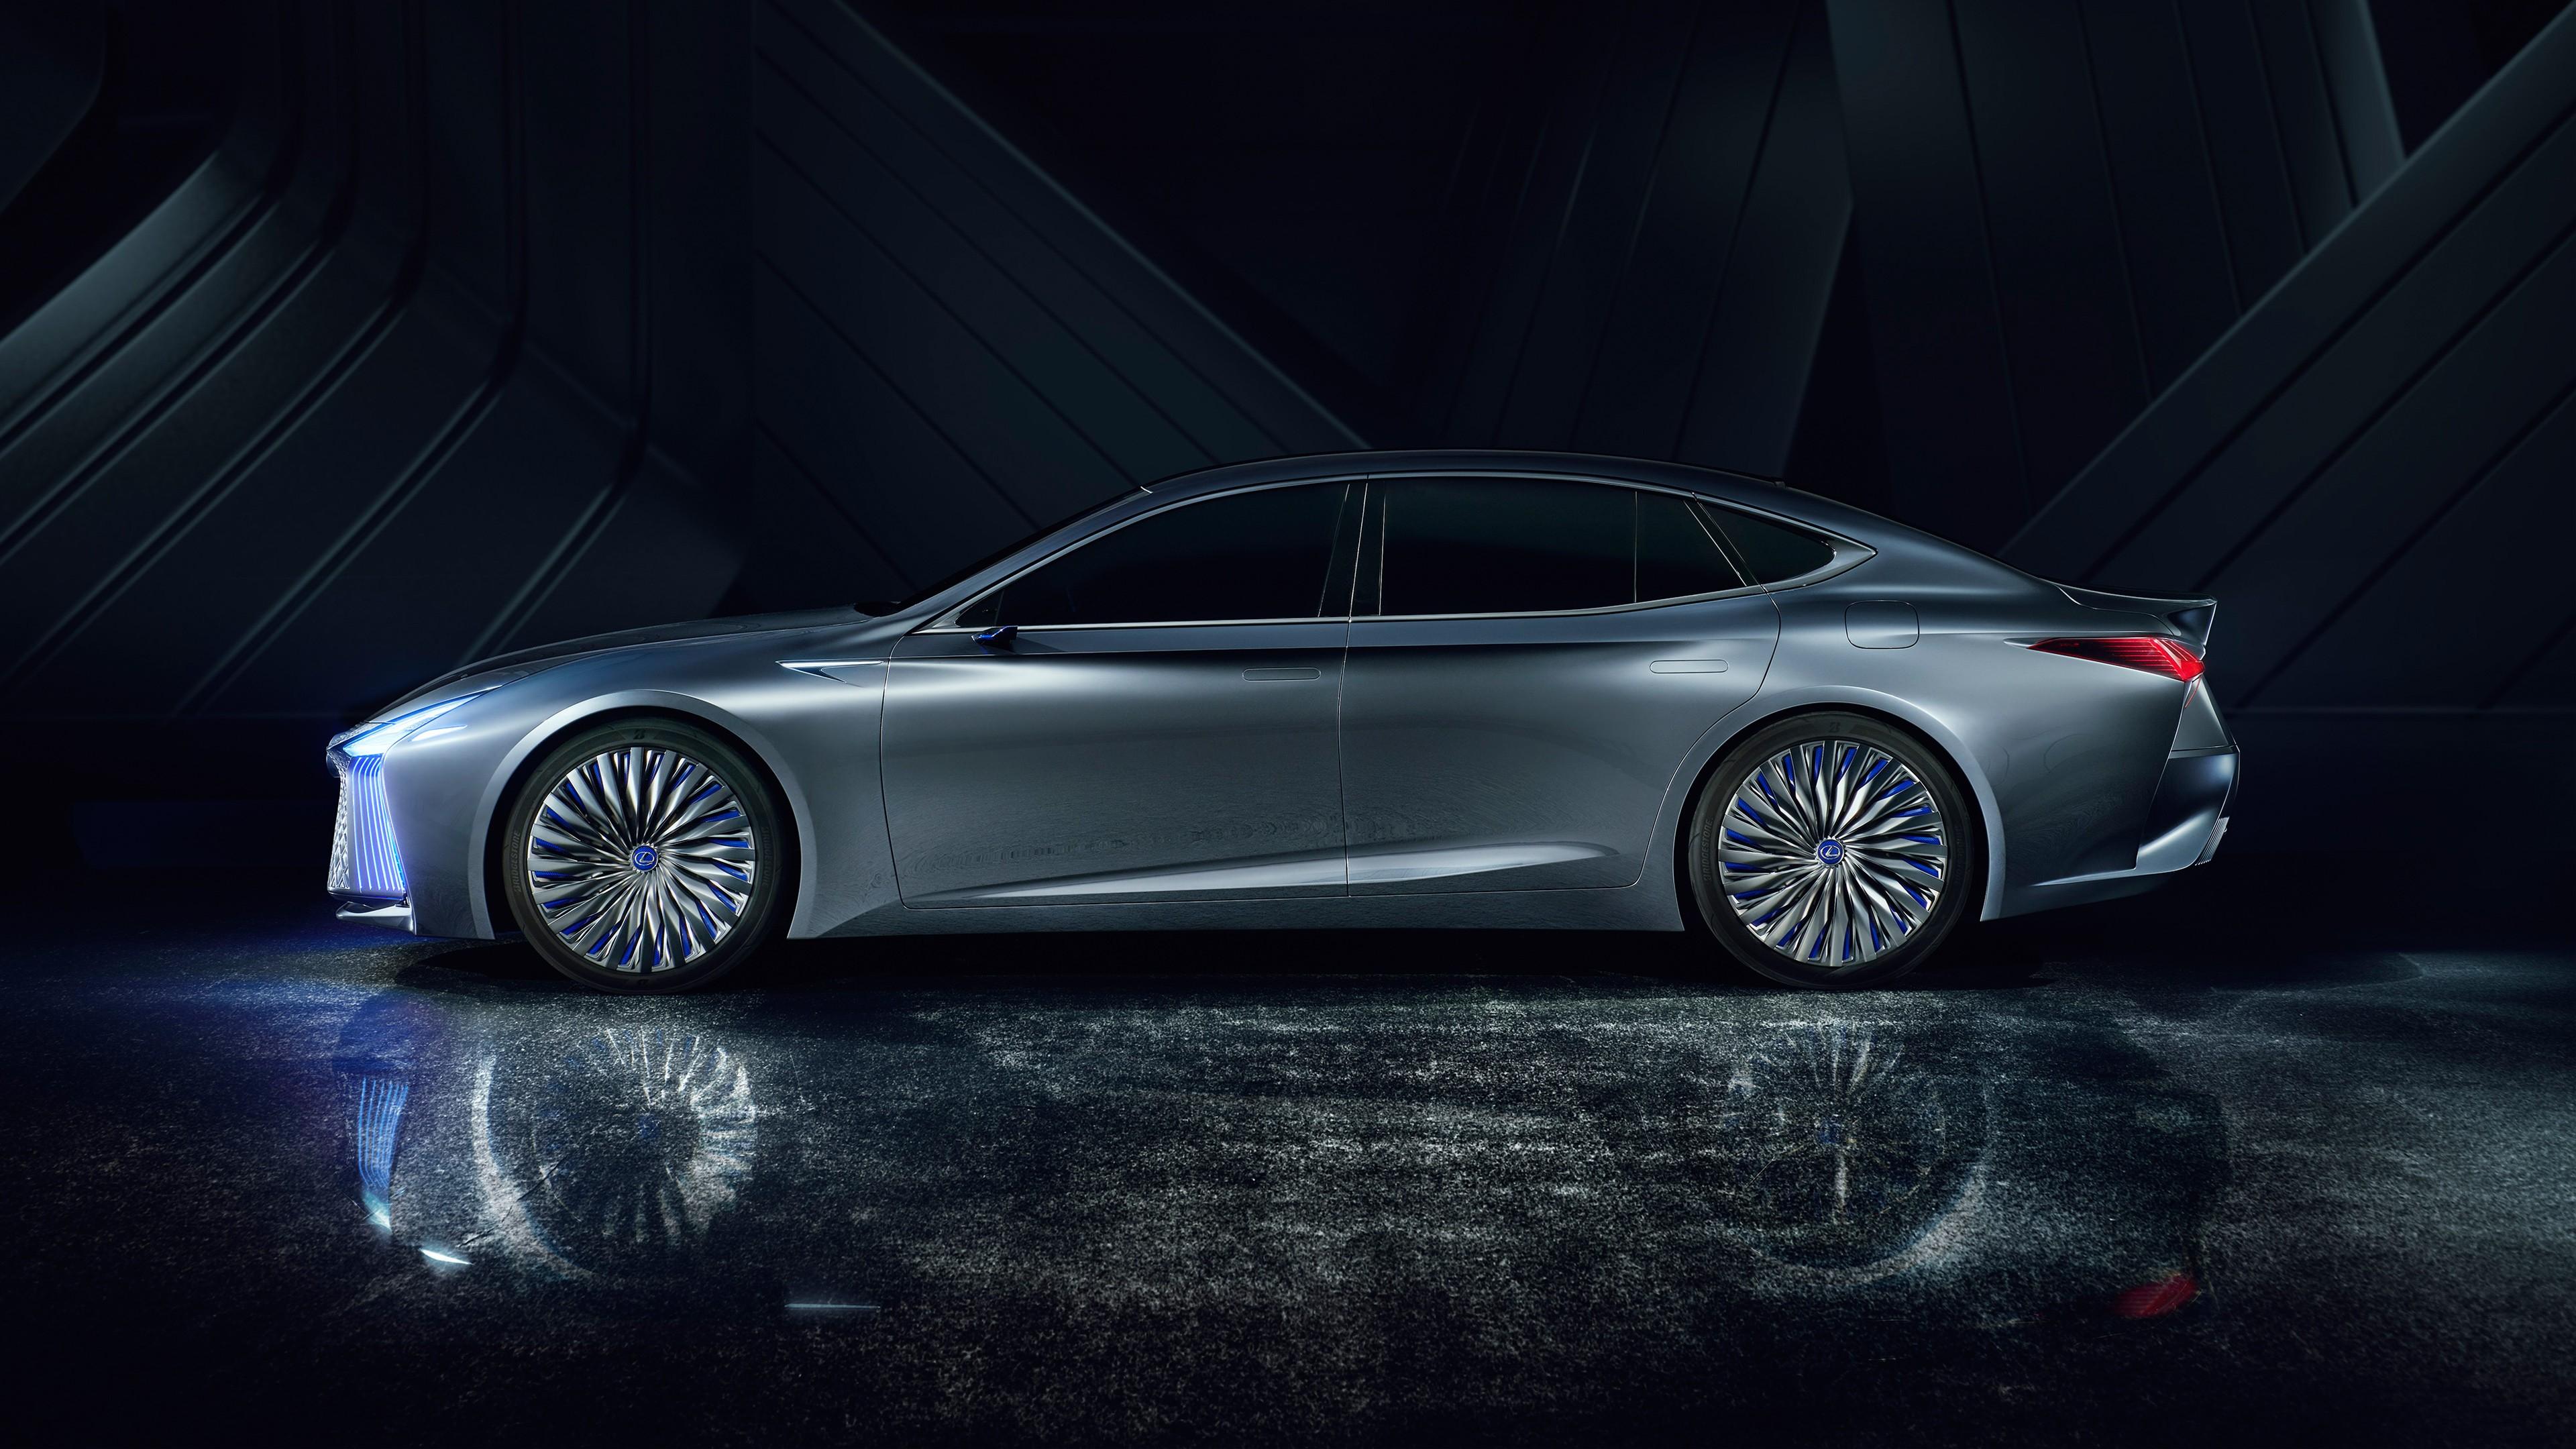 2017 Lexus LS Plus Concept 4K Wallpaper | HD Car ...